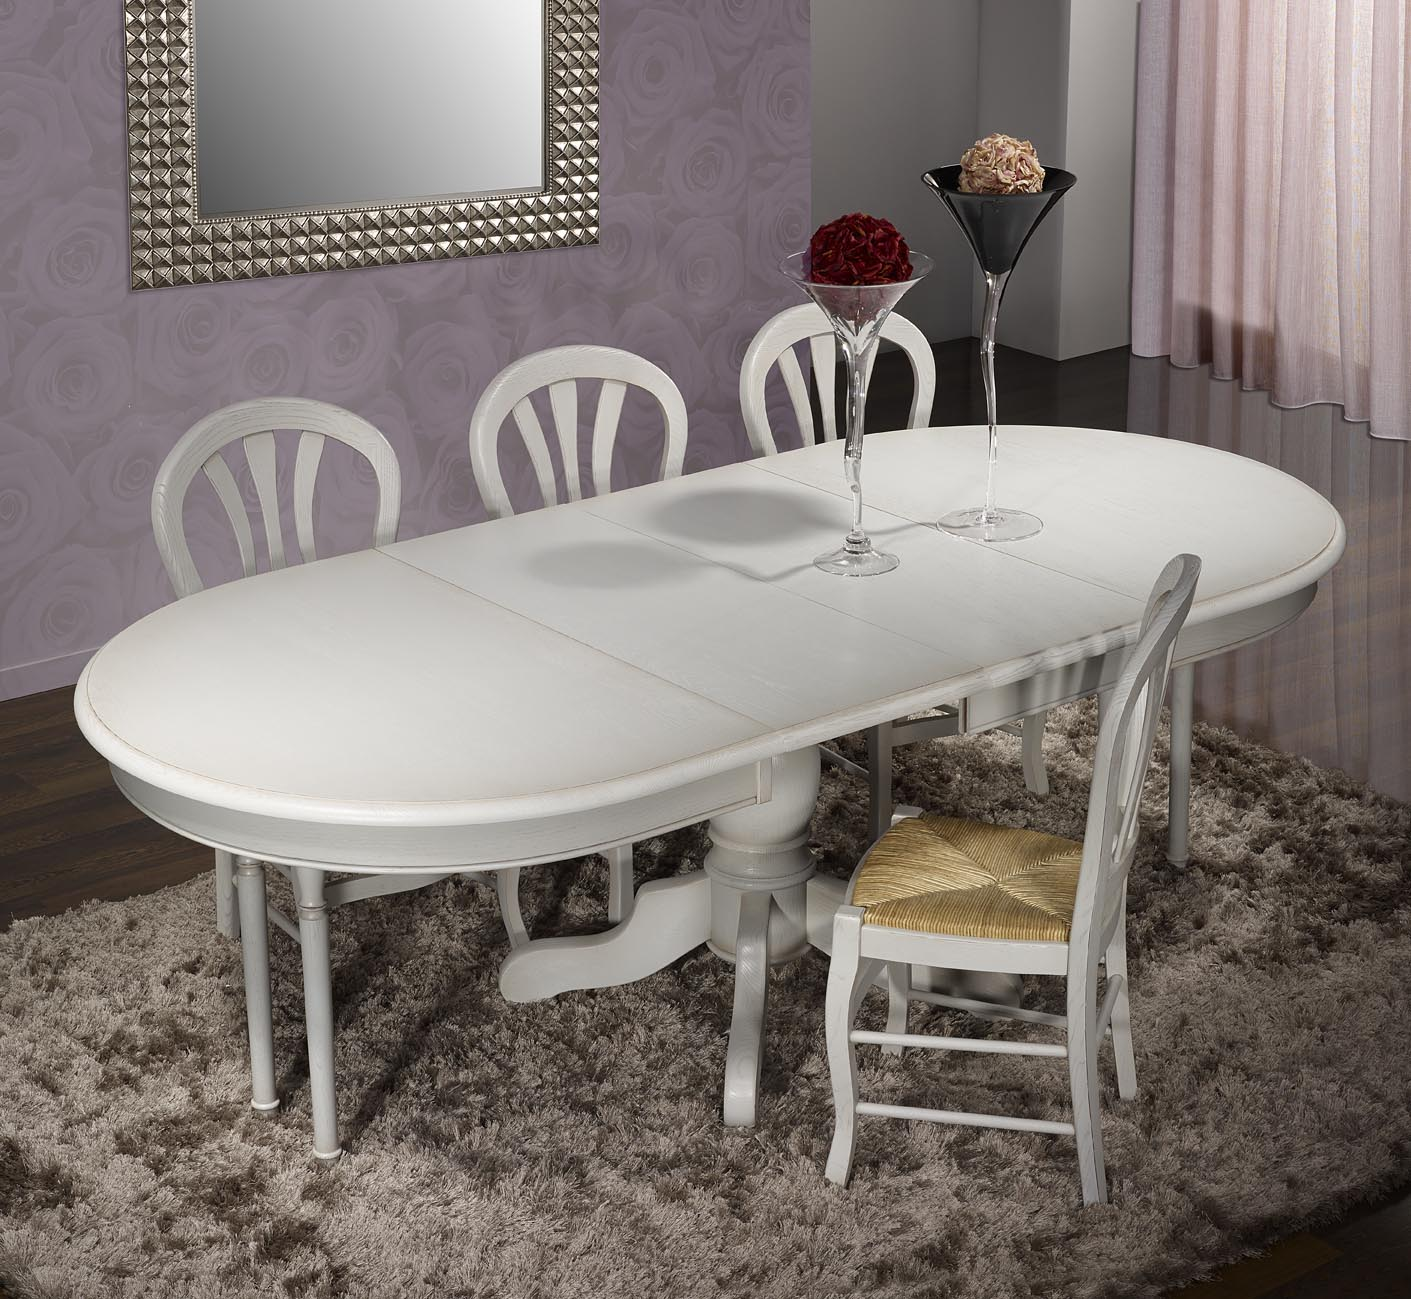 Table ovale pied central romain en ch ne massif de style for Table ovale chene massif